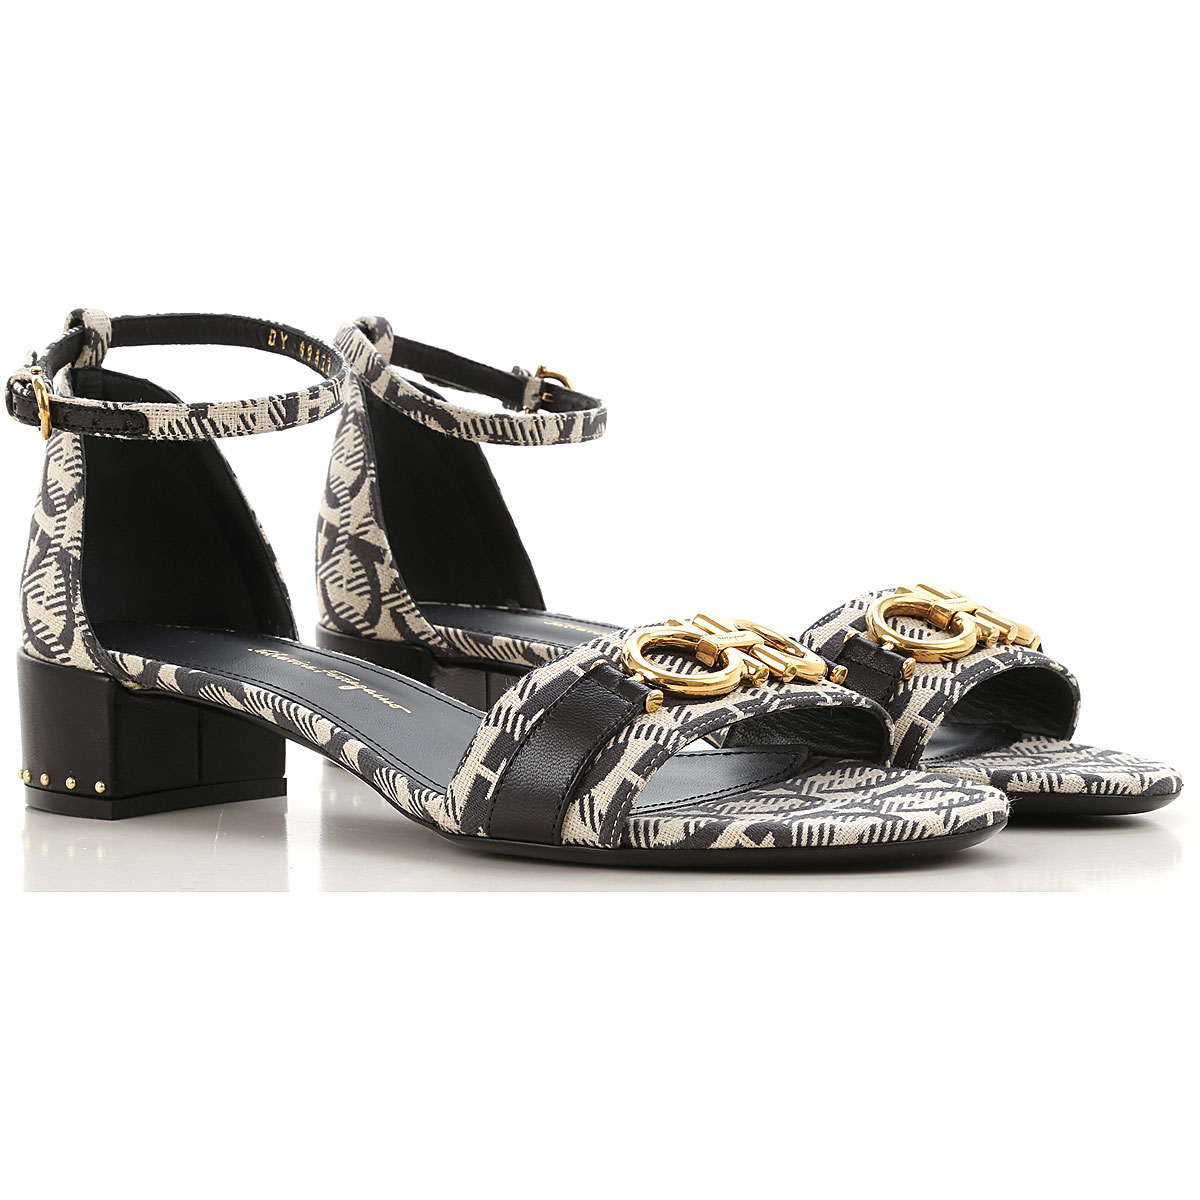 Salvatore Ferragamo Sandals for Women On Sale, Black, Textile, 2019, 5.5 6.5 7 8 8.5 9.5